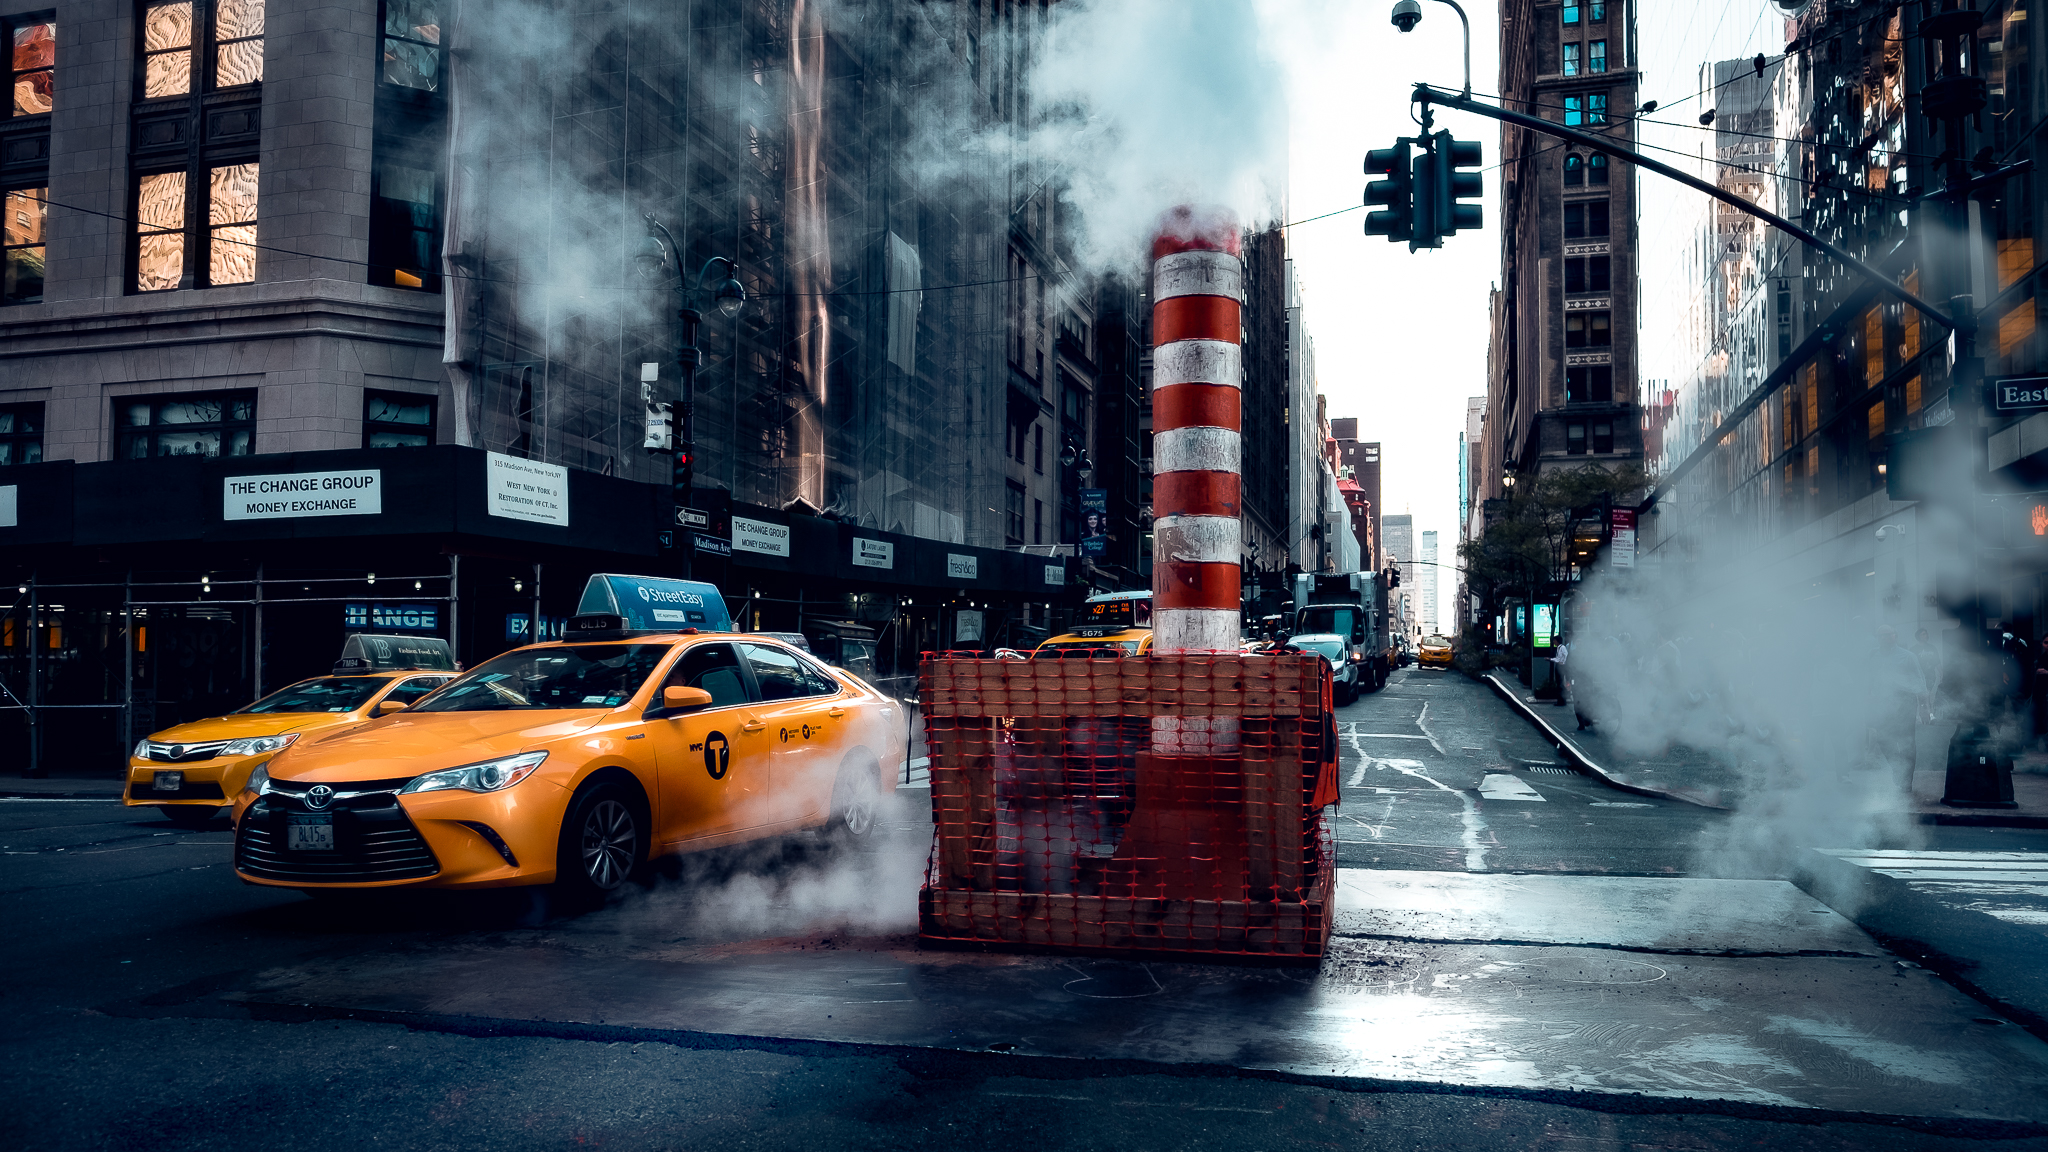 2017-09-11-newyork1 (132)-Modifier-test.jpg